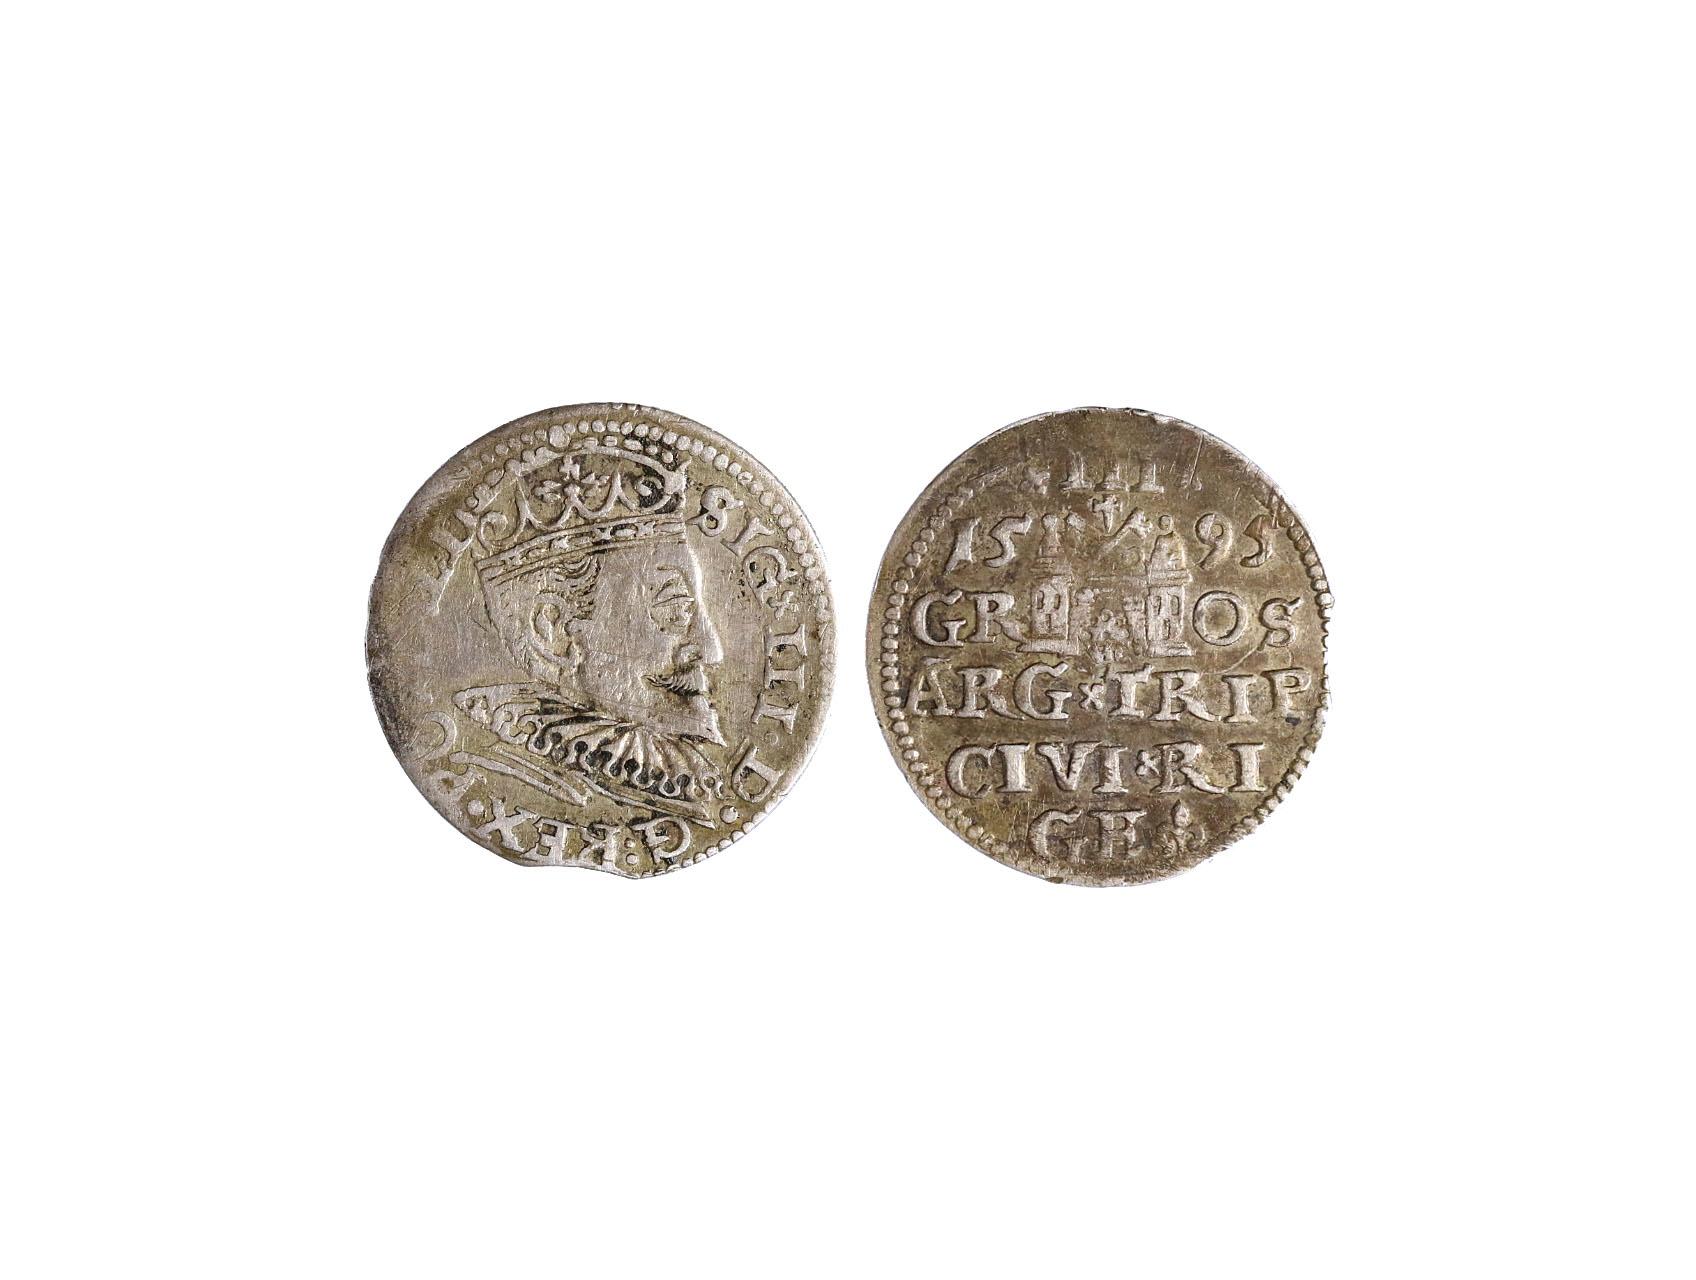 Polsko, Zikmund III. Vasa 1587-1632 - III. Groš 1595 Riga, Ko-8191